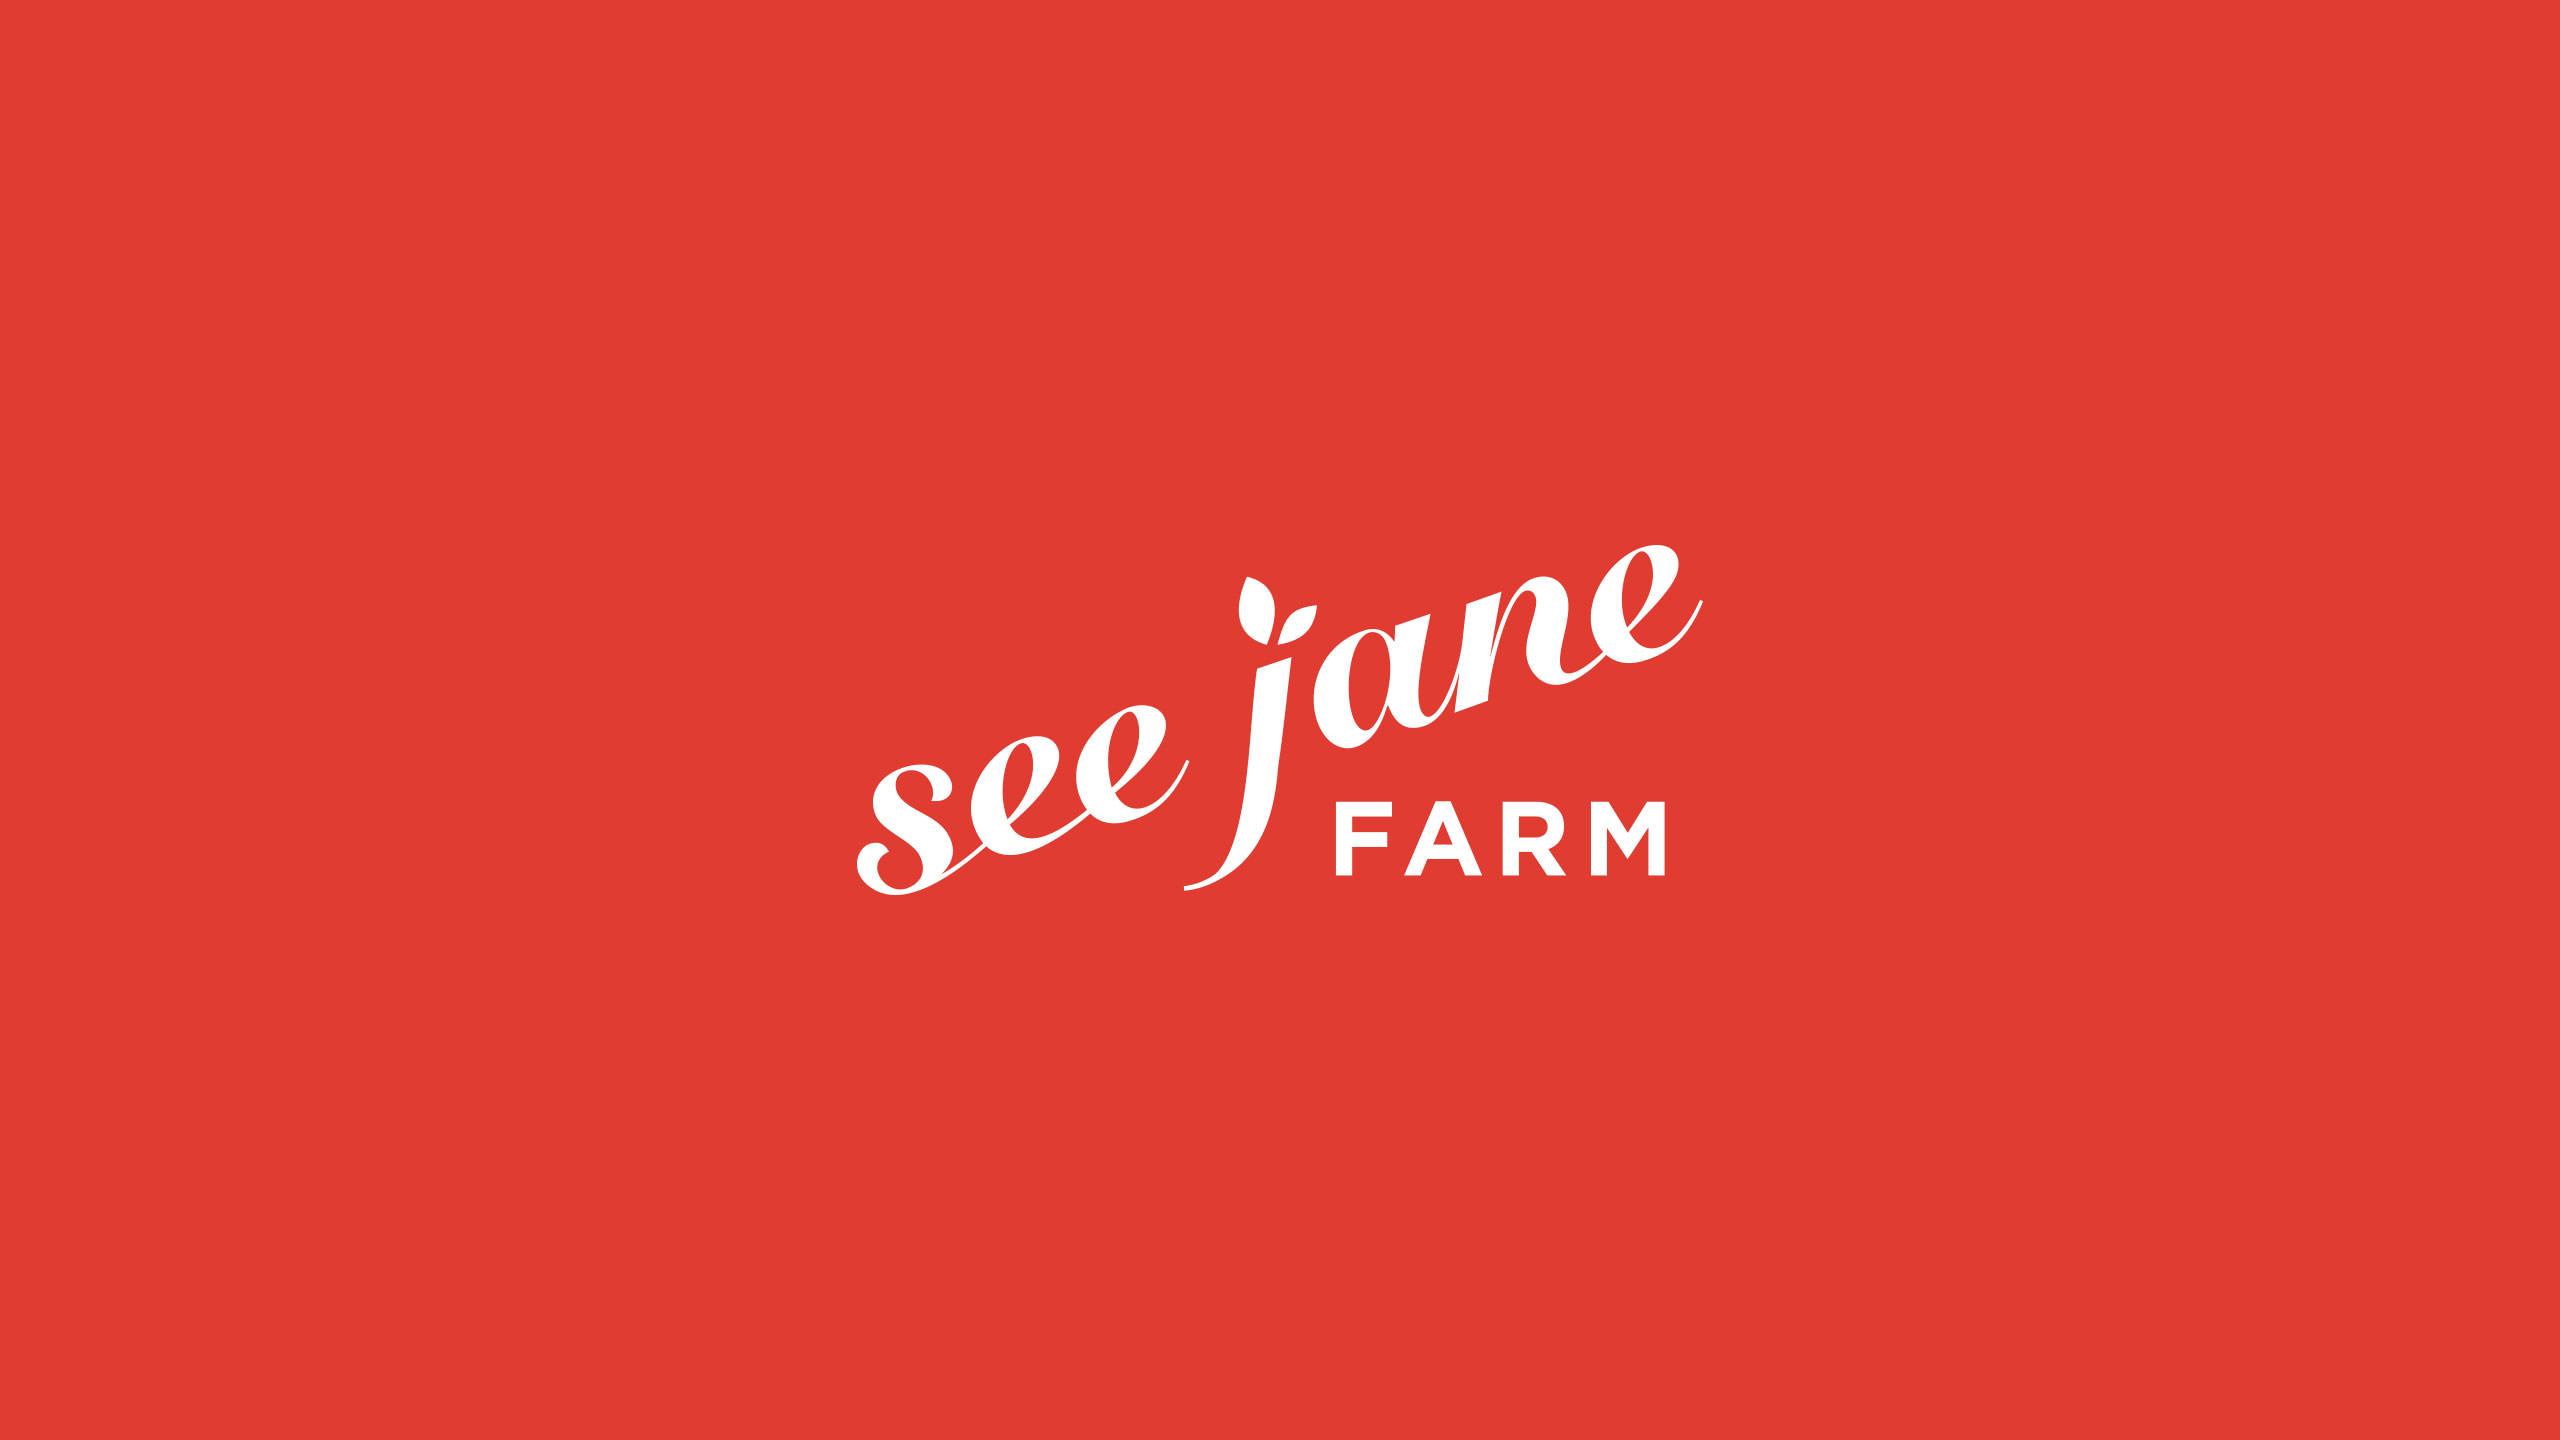 See-Jane-Farm-identity